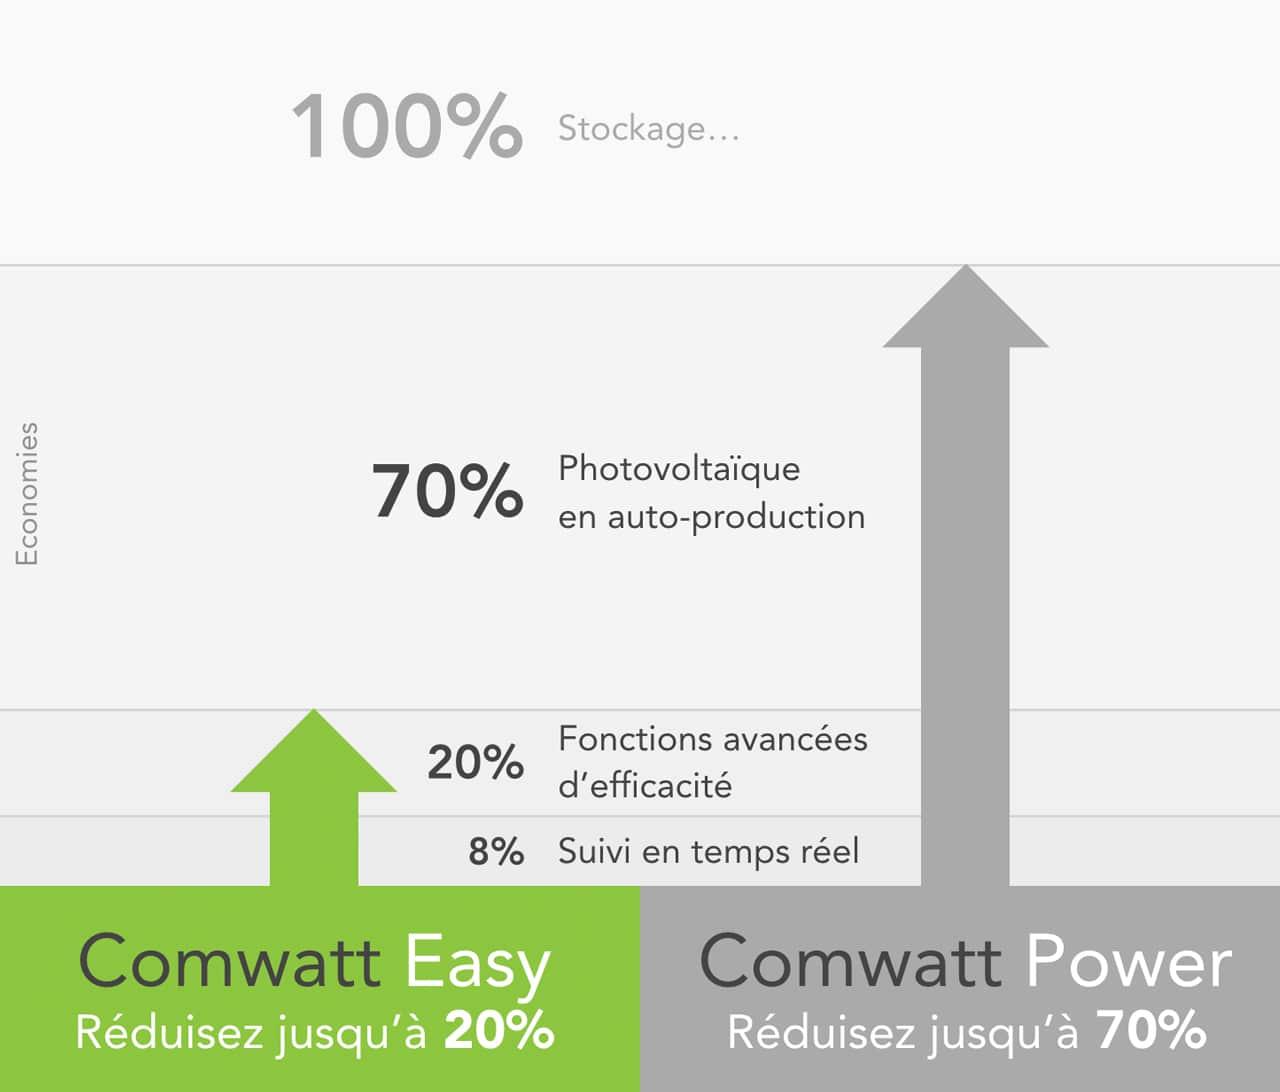 Performance Comwatt Easy